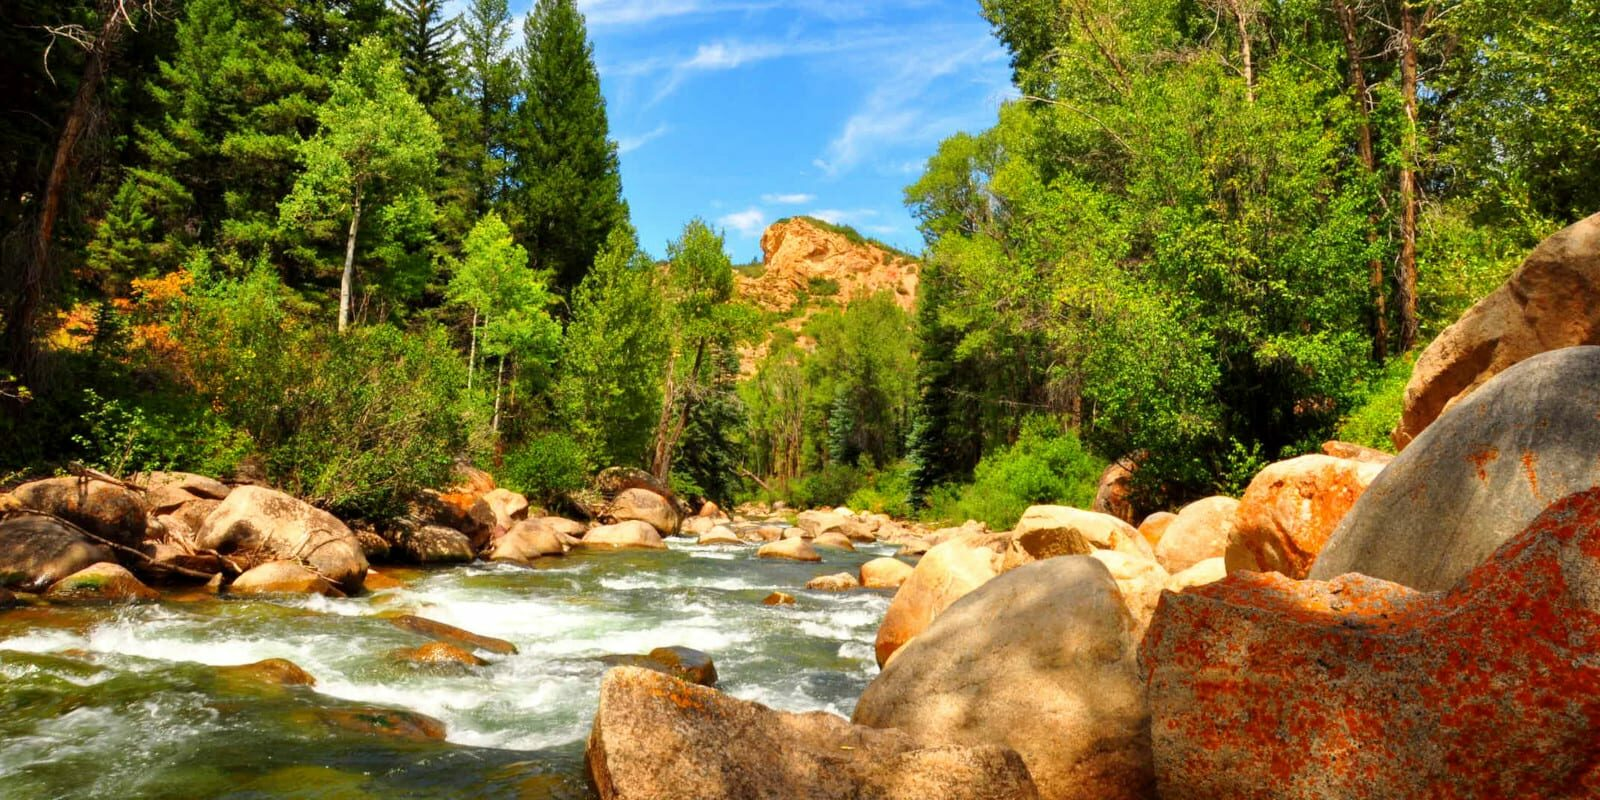 Image of Roaring Fork River in Colorado near Aspen